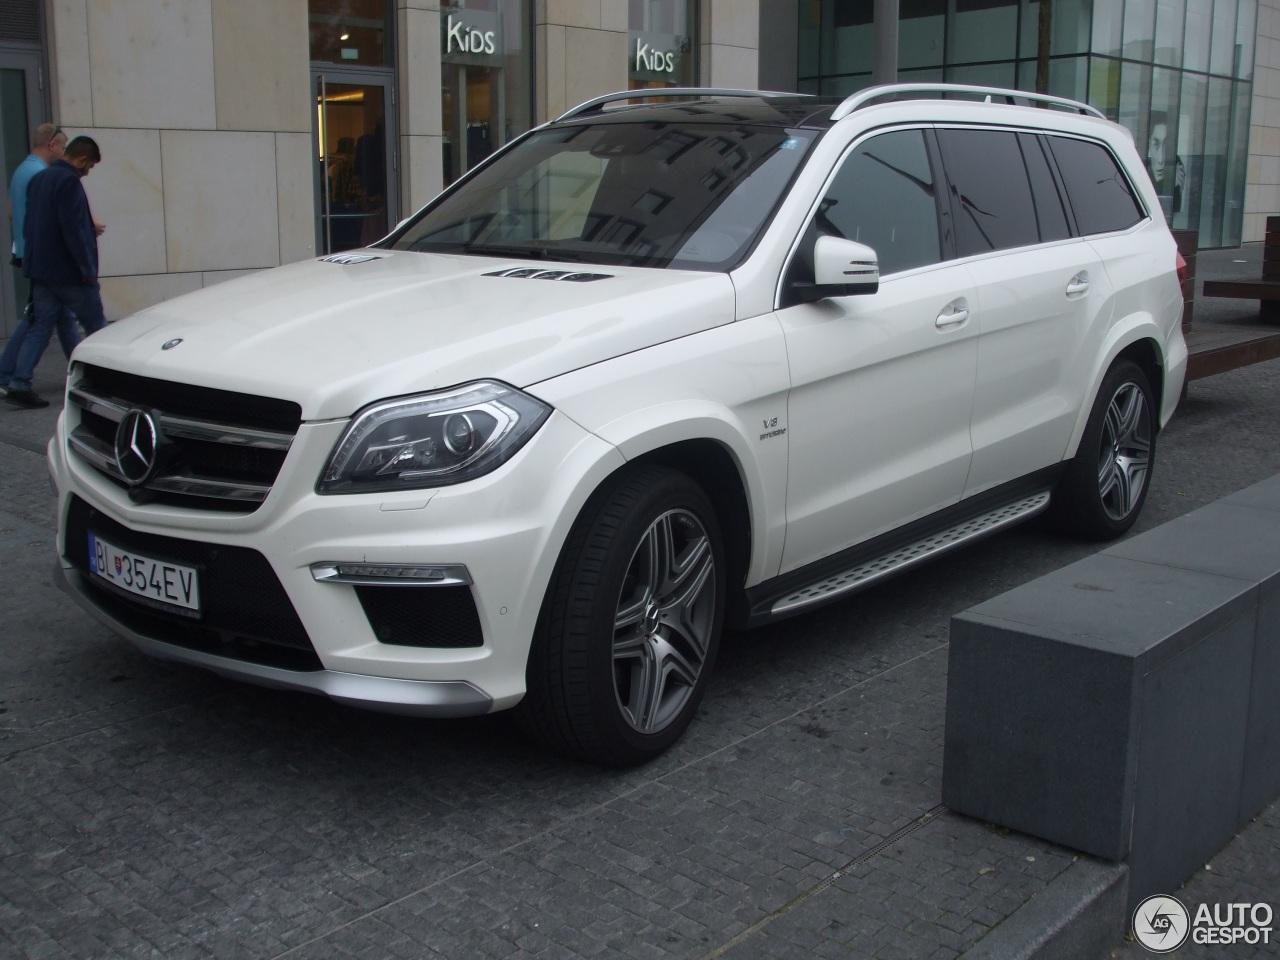 Mercedes benz gl 63 amg x166 7 october 2015 autogespot for Mercedes benz gl amg 2015